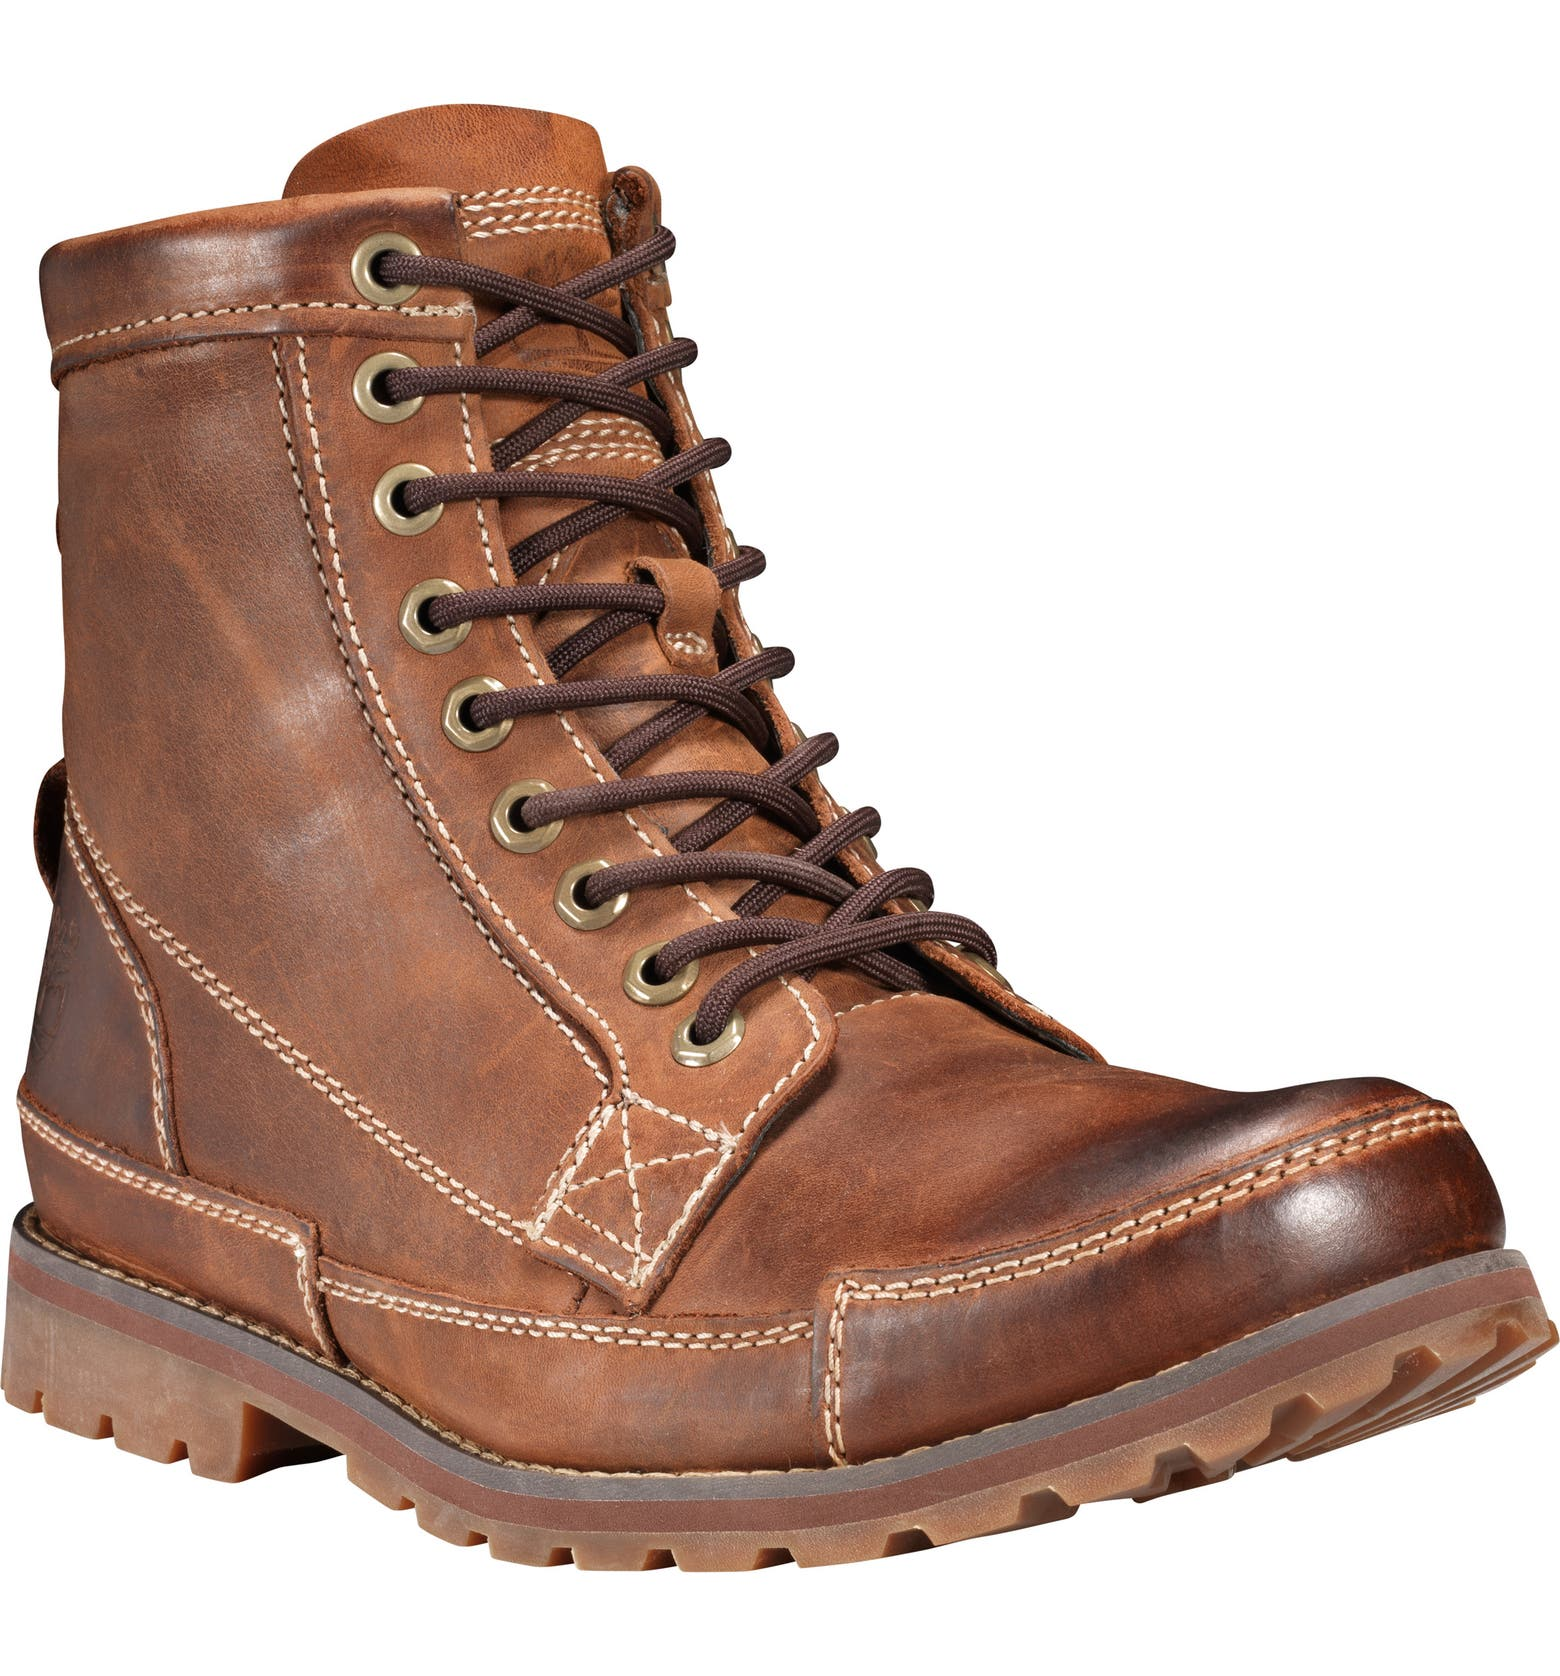 Earthkeepers® Original Mid Plain Toe Boot TIMBERLAND